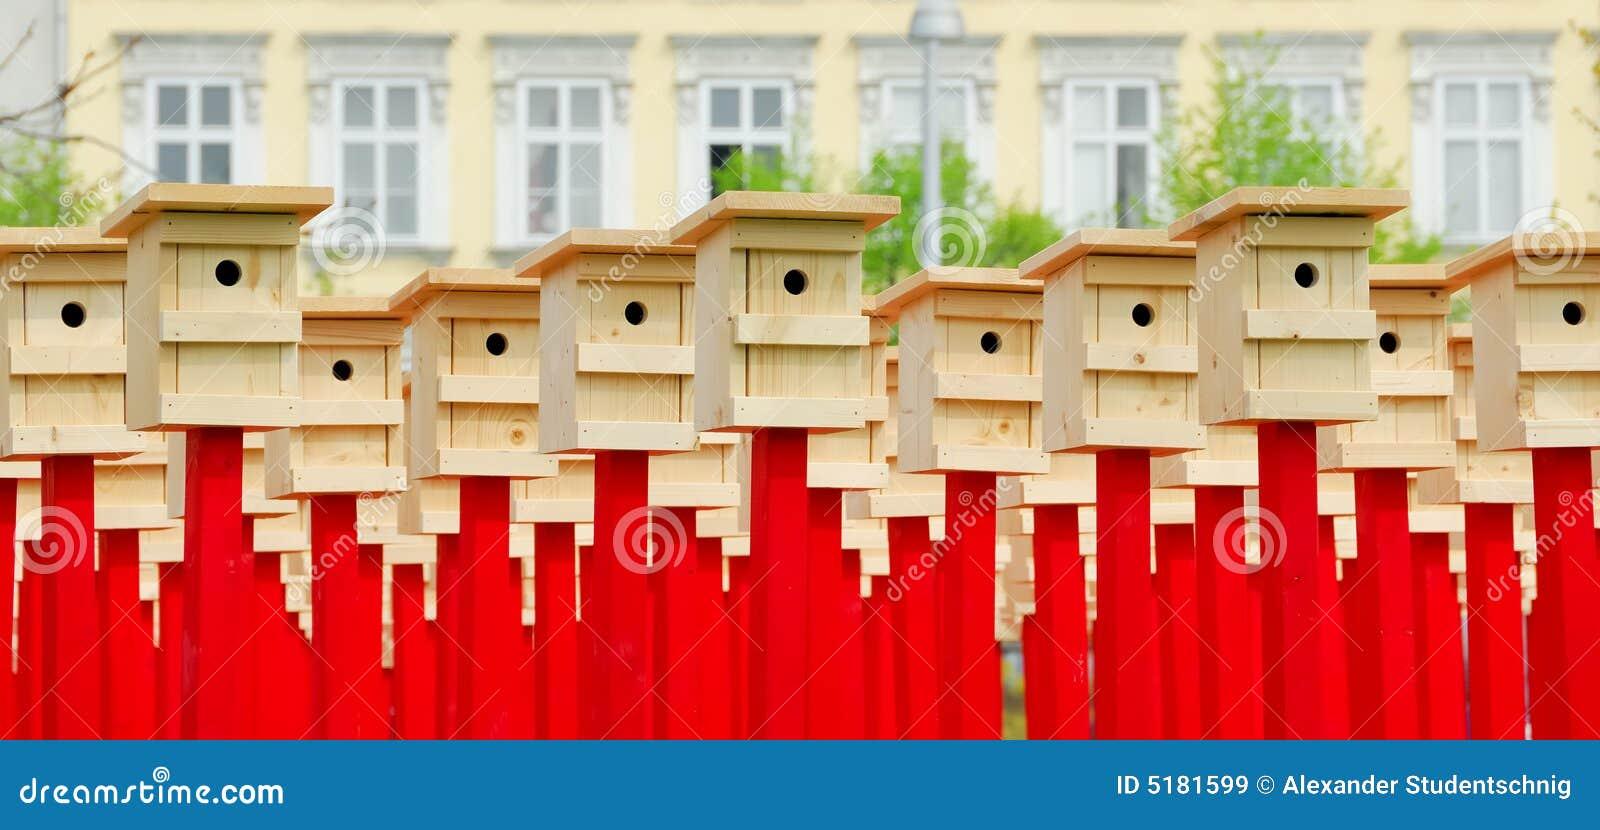 birdhouse art no 2 stock image image of artwork building 5181599 rh dreamstime com birdhouse art pole birdhouse artist